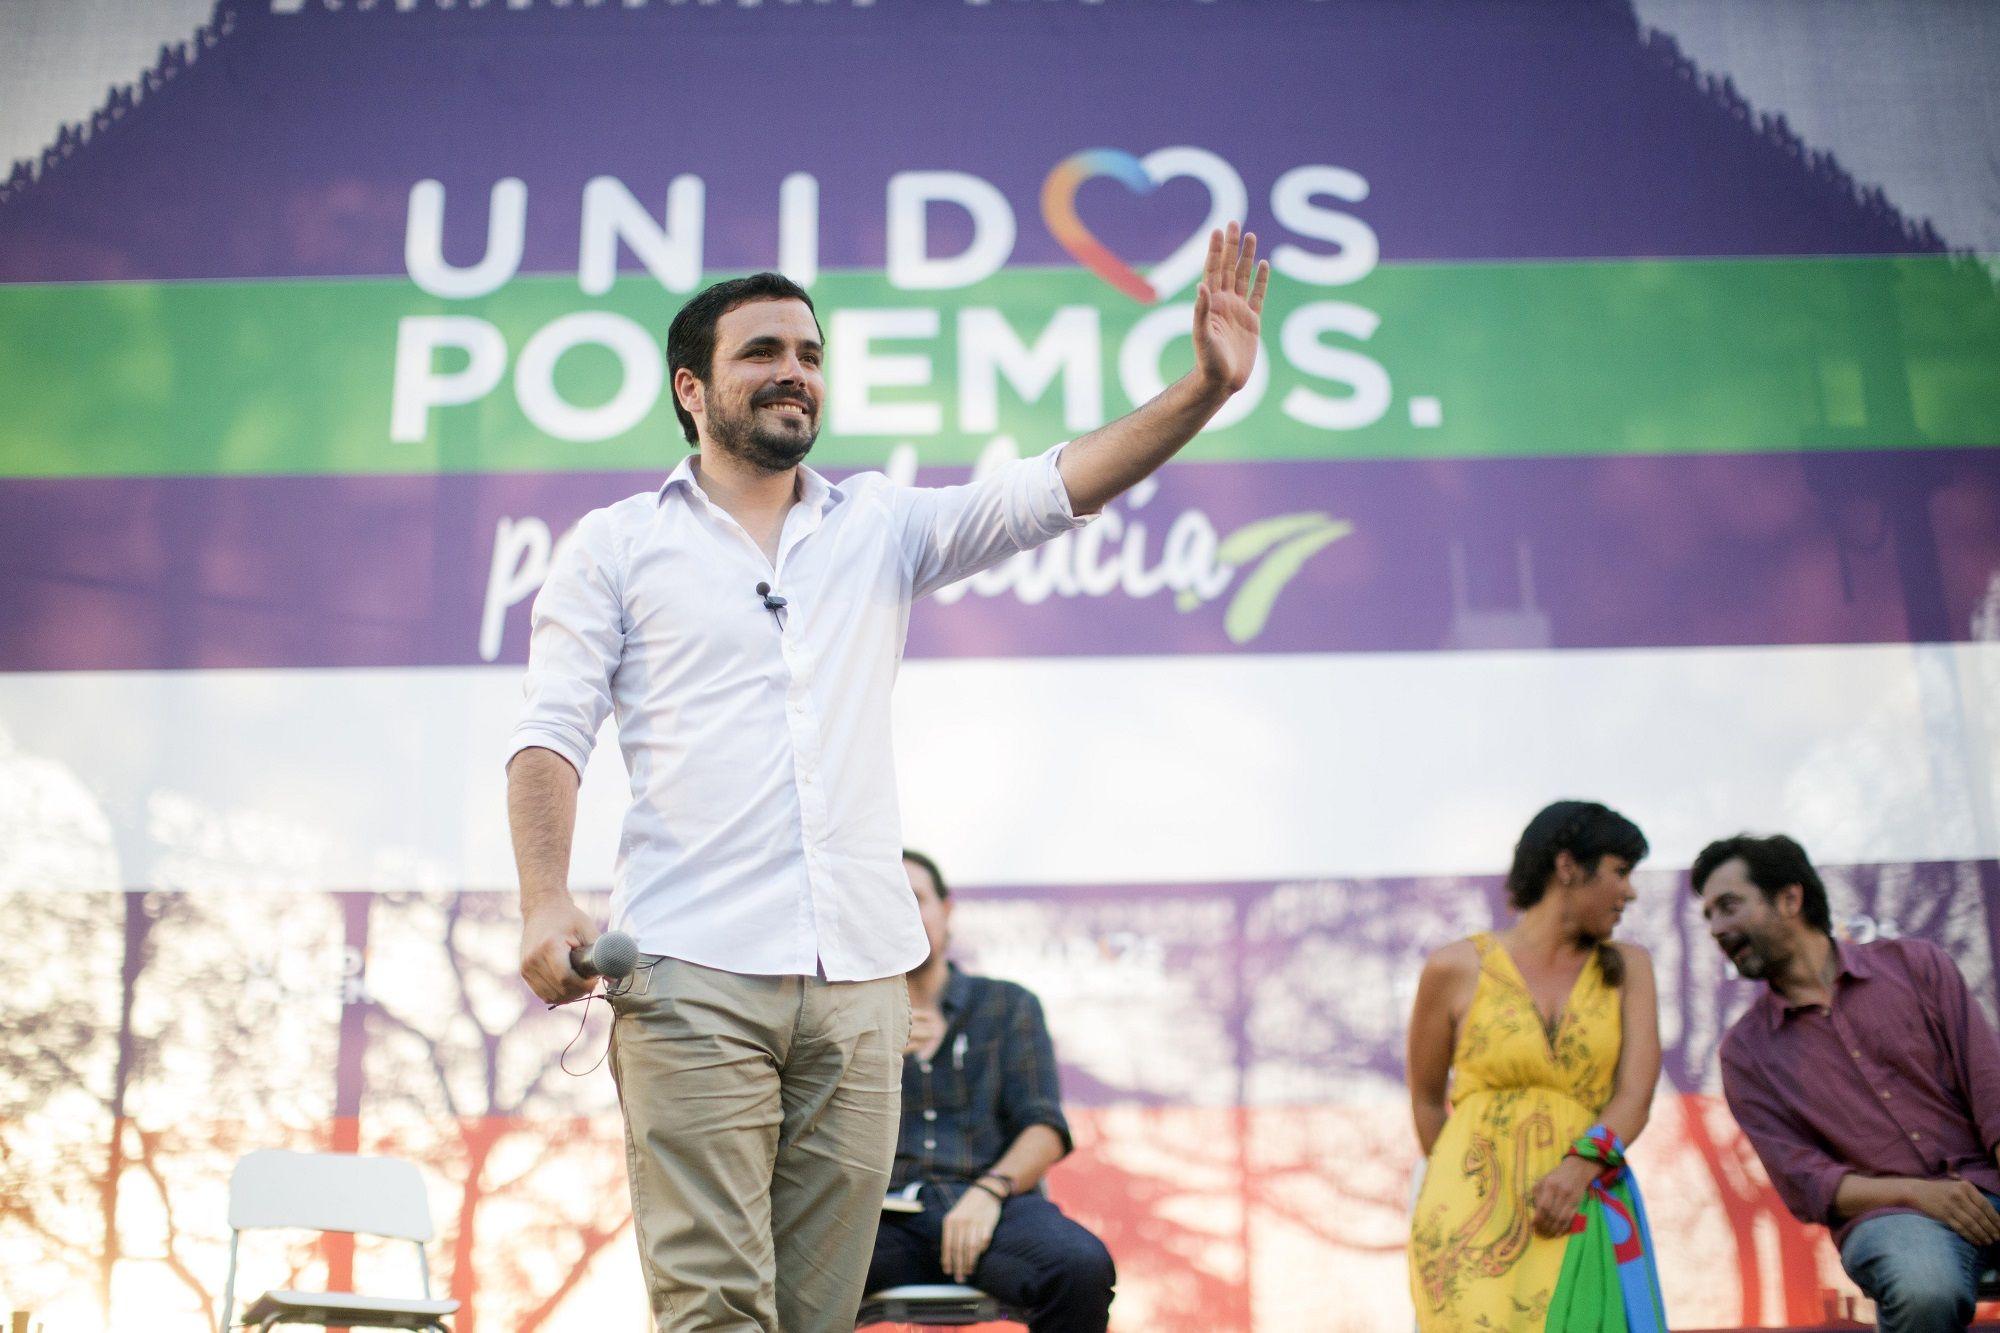 Intervención de Alberto Garzón, secretario general de Izquierda Unida, en elmitin de Unidos Podemos   23 jun 2016   Juan Carlos Corchado para MIRA Jerez